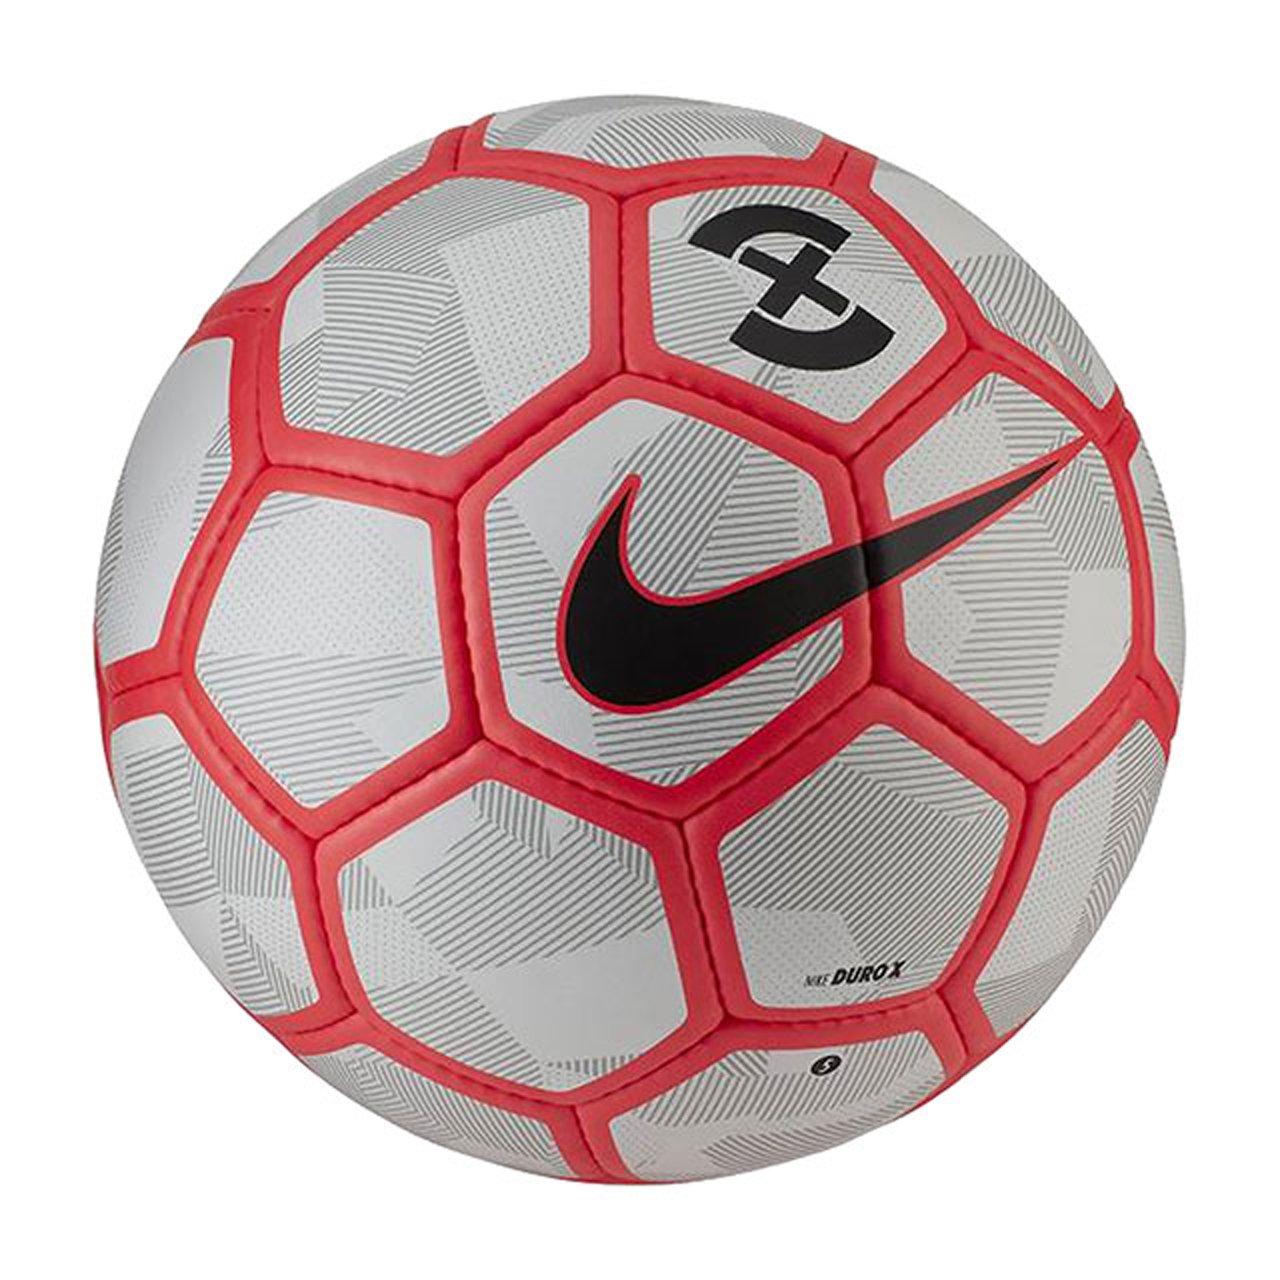 586d4944de4 Amazon.com  Nike Duro X Soccer Ball (5)  Sports   Outdoors